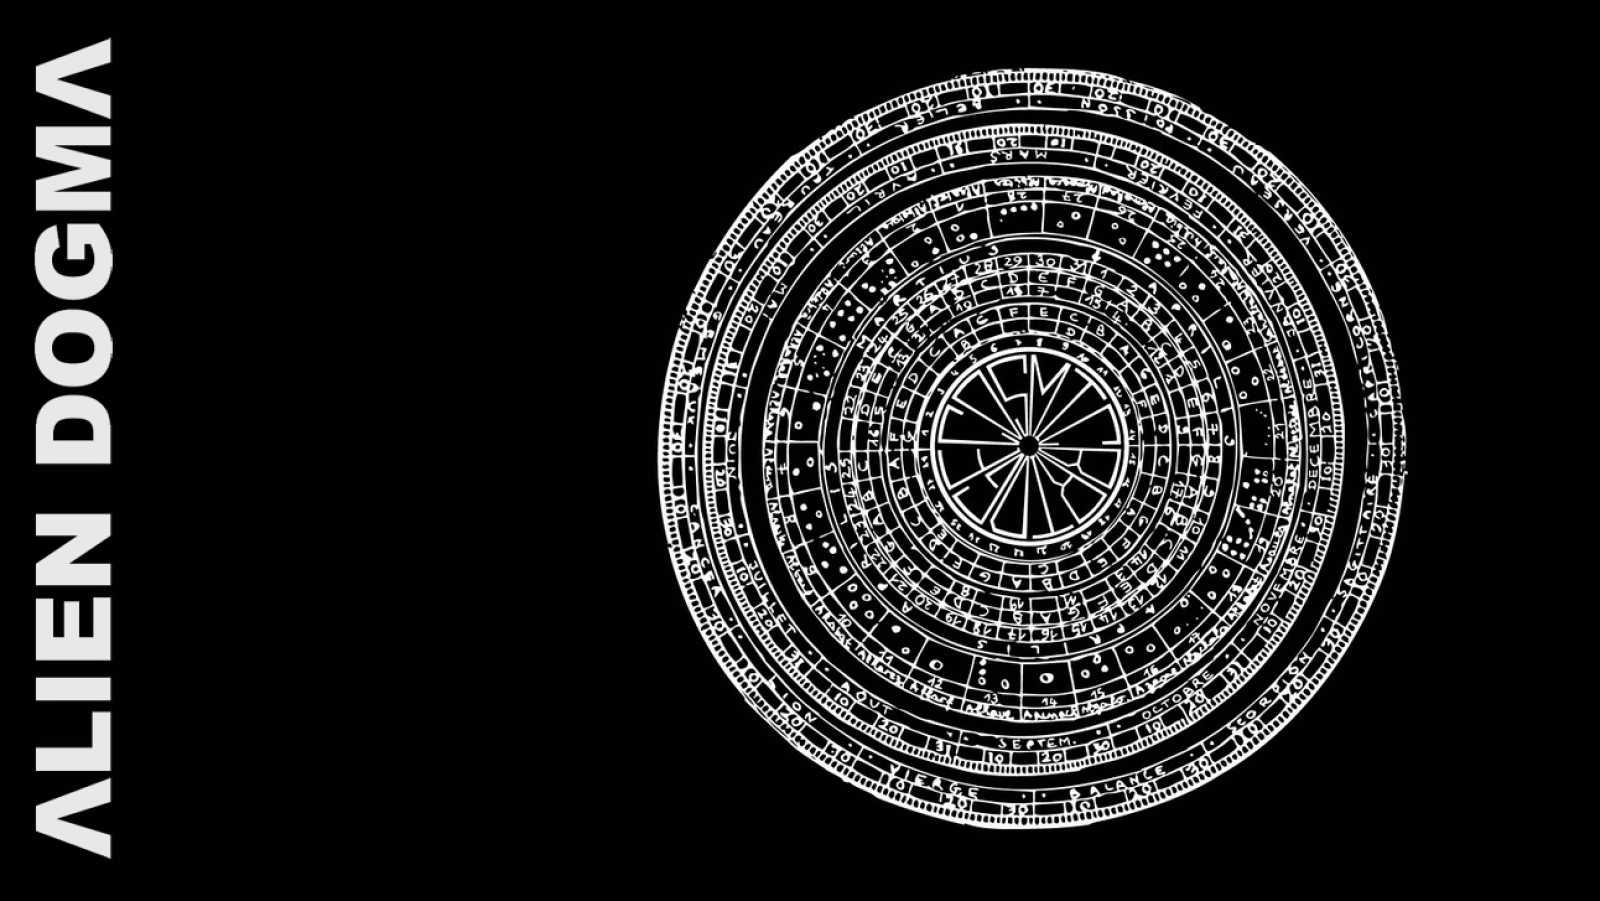 Alien Dogma - Cosmology  - Escuchar ahora